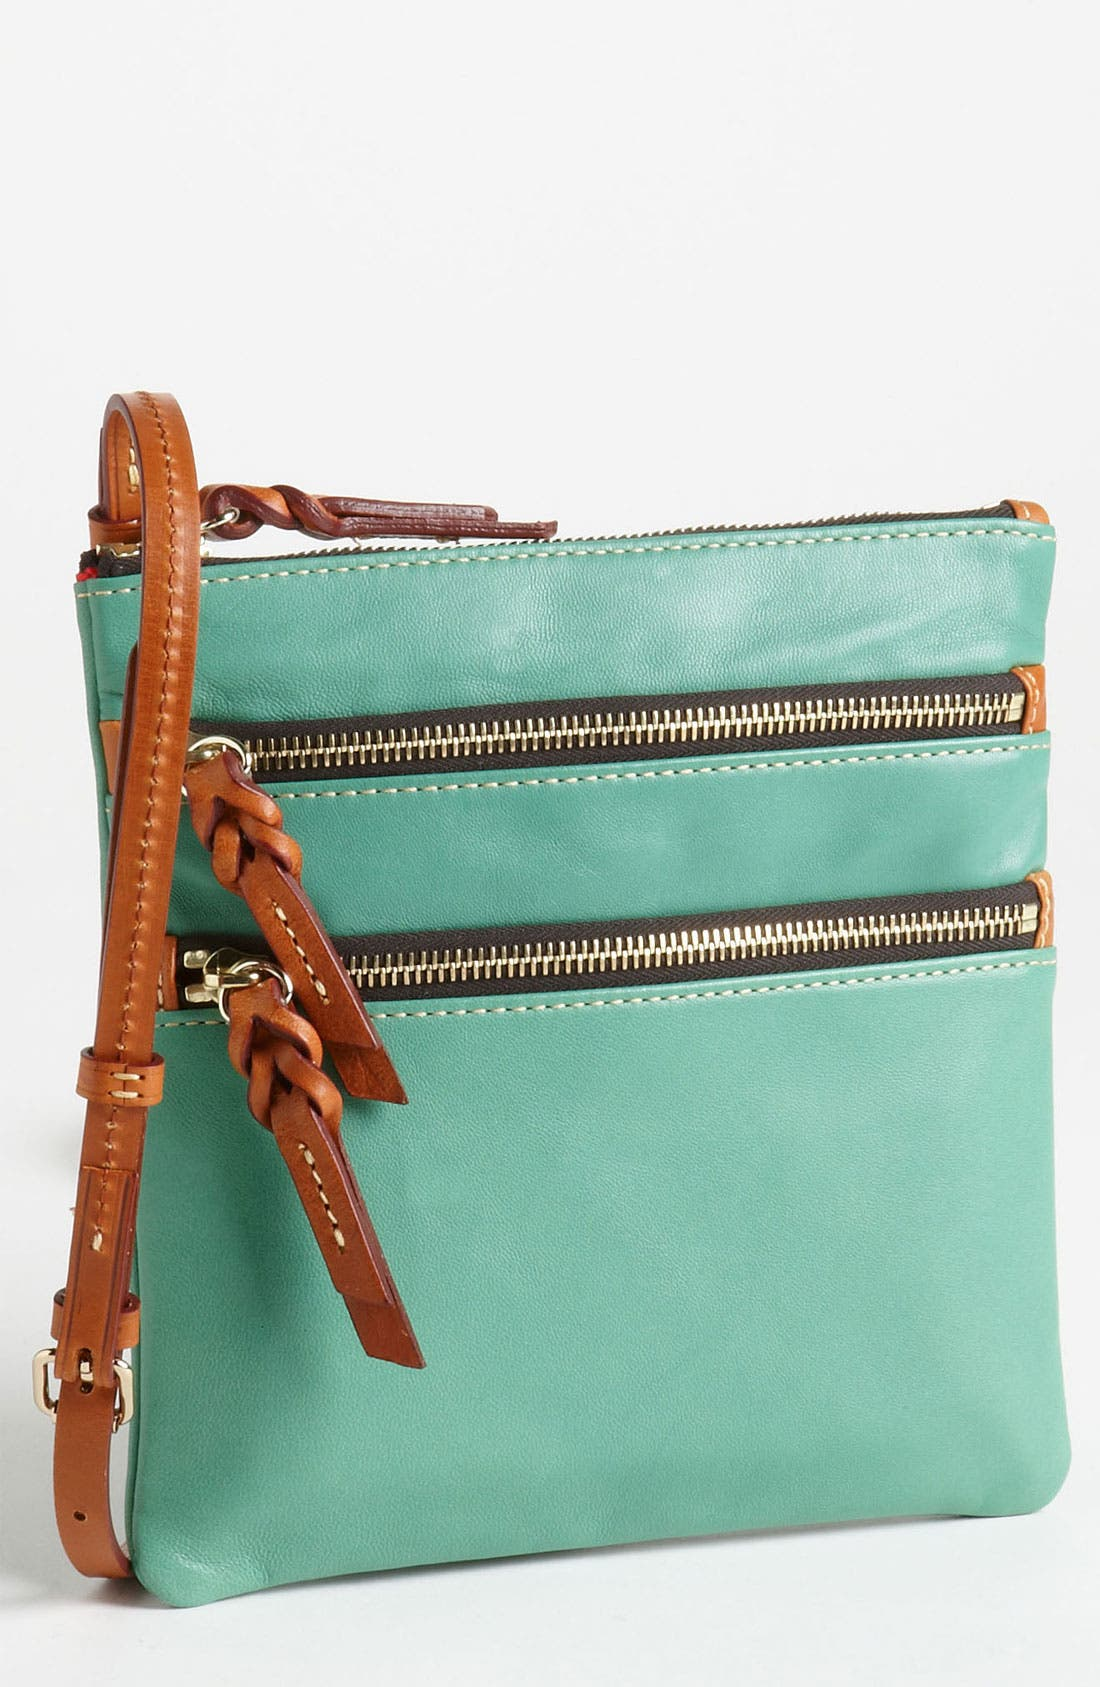 Alternate Image 1 Selected - Dooney & Bourke Triple Zip Leather Crossbody Bag